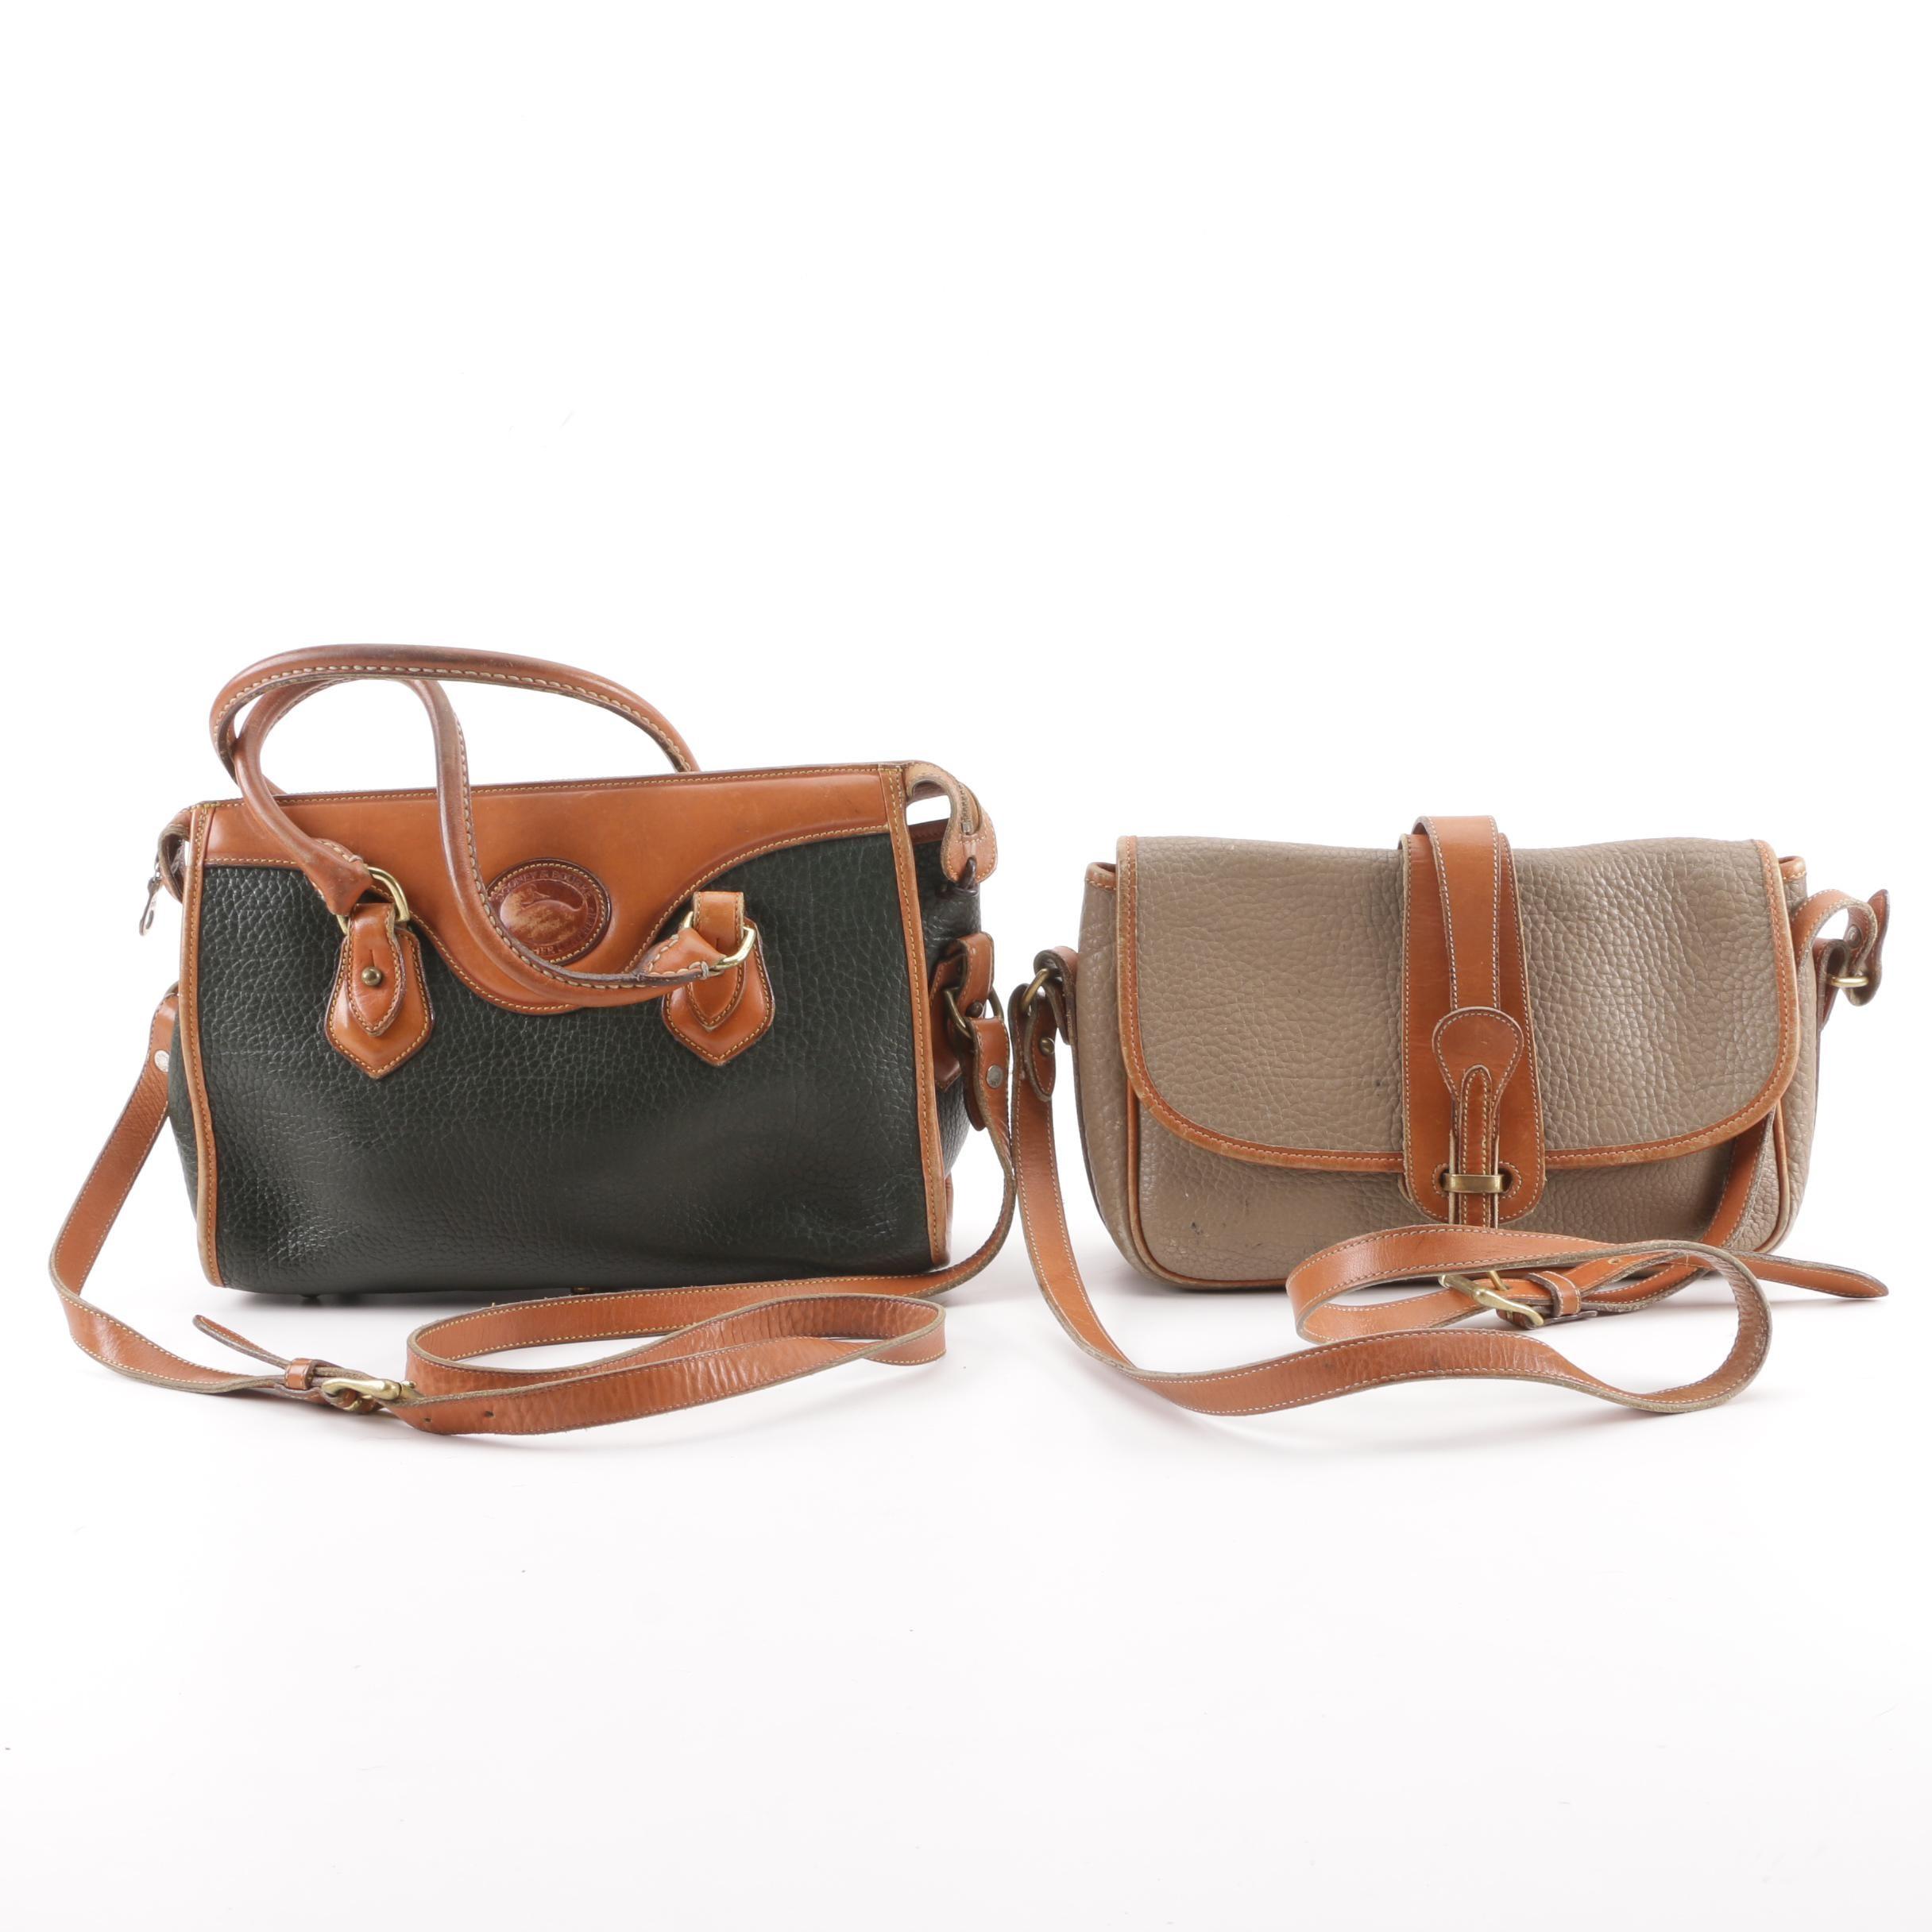 Dooney & Bourke All-Weather Leather Shoulder Bag and Convertible Satchel